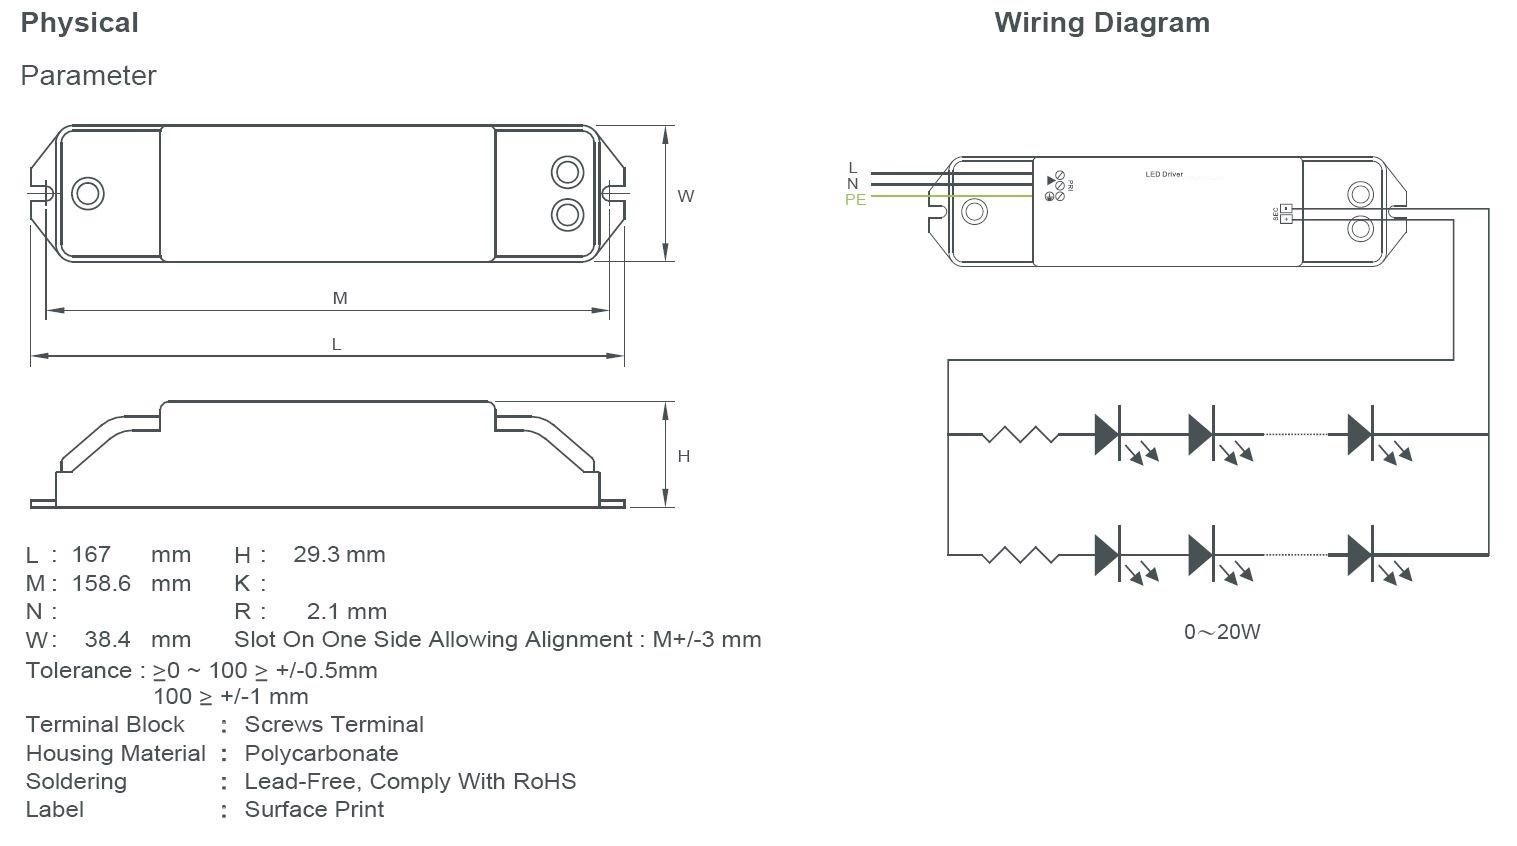 Lumidriver Accessories Sylvania Lighting Solutions Physicalblockdiagramjpg Technical Drawing 1